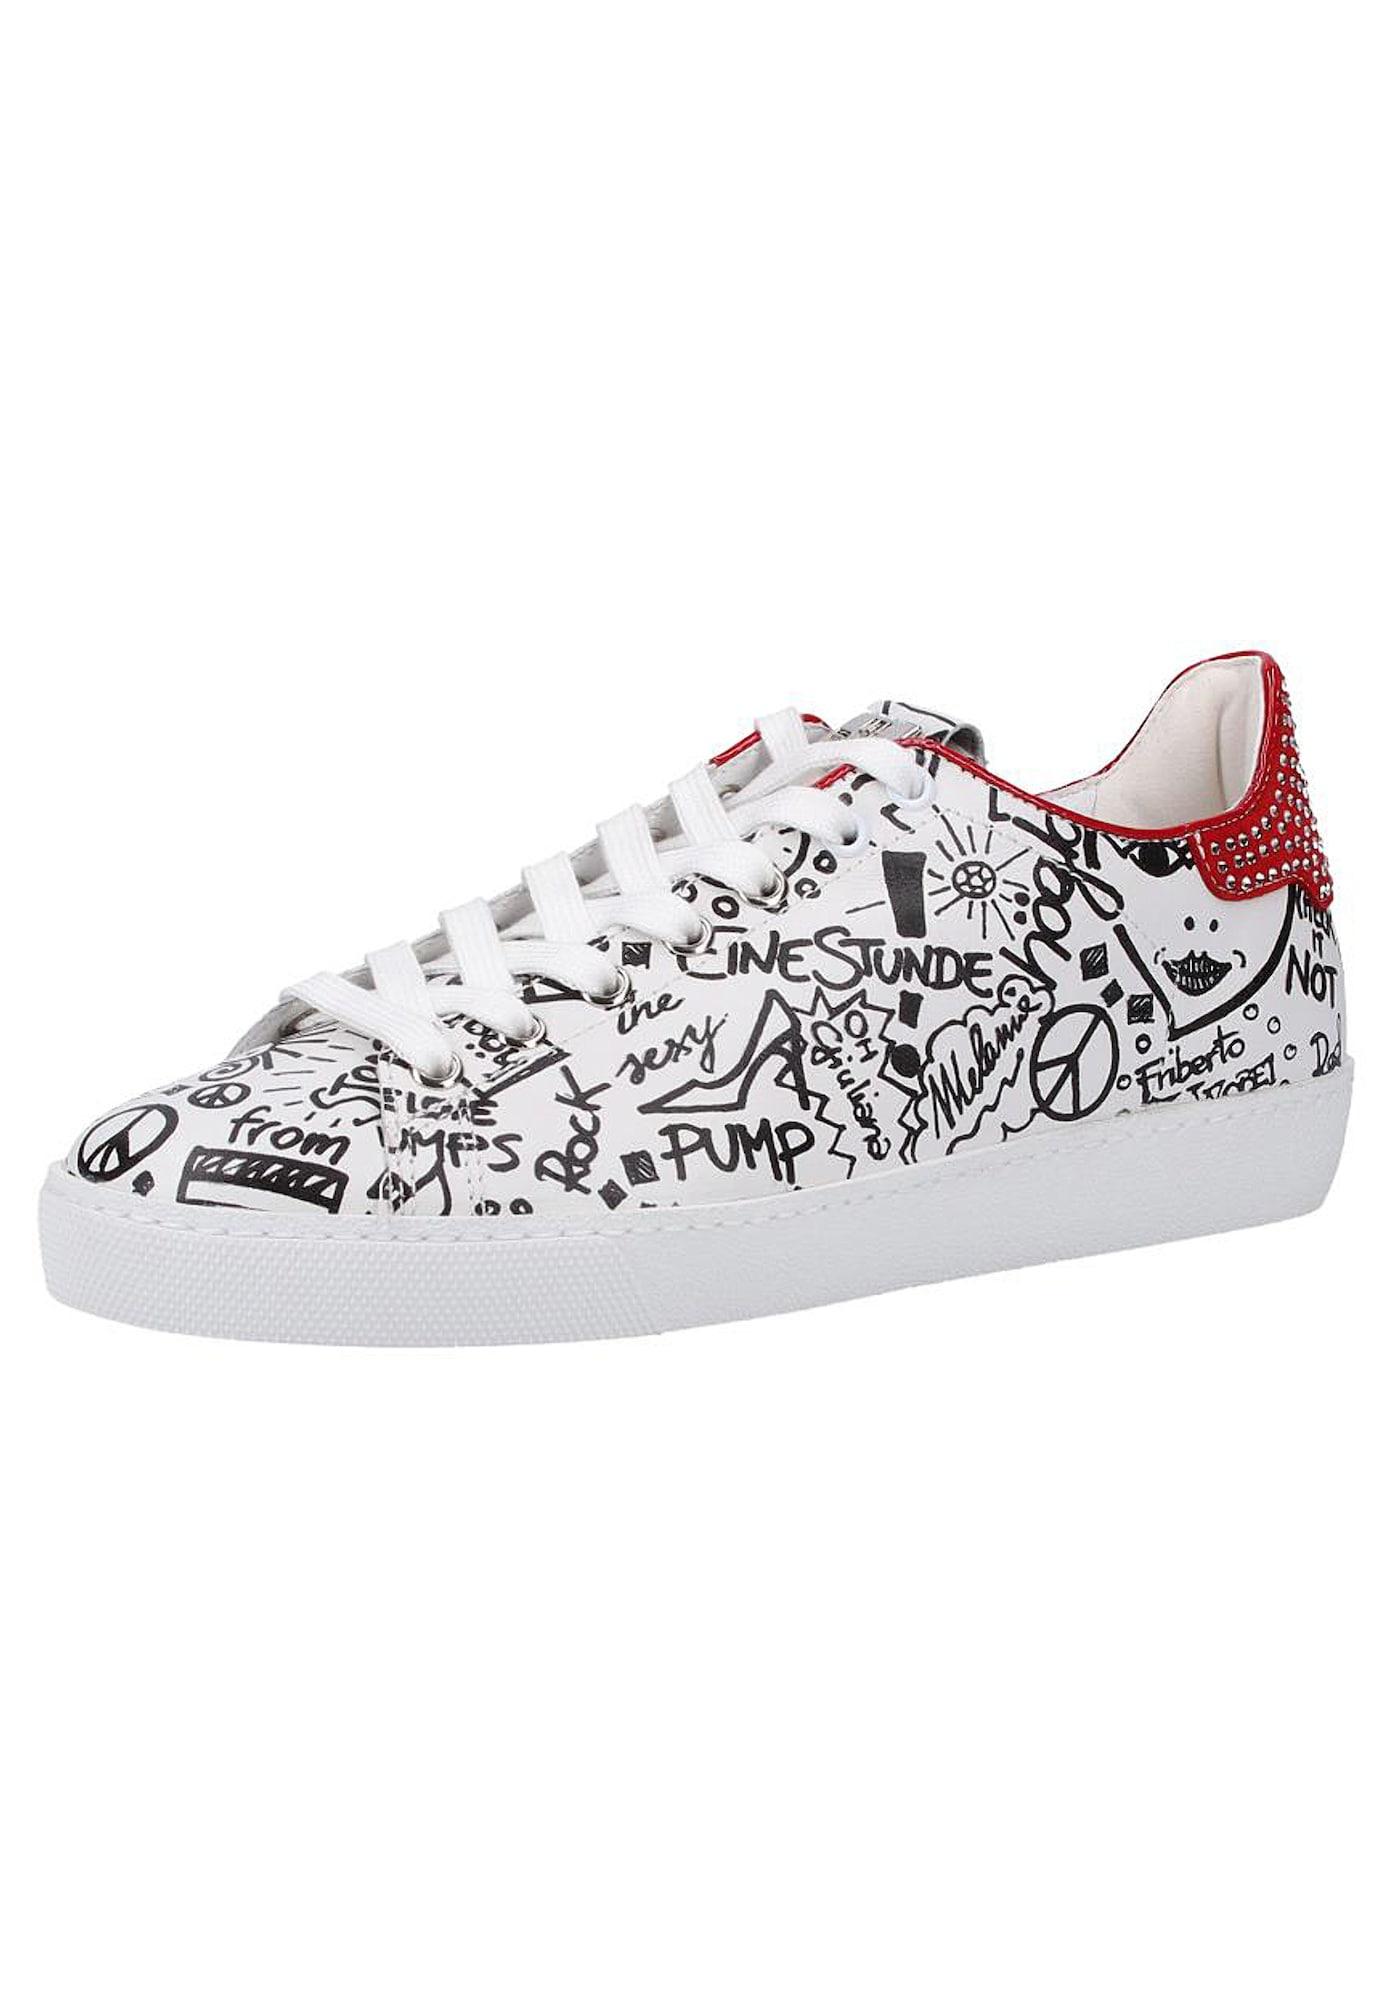 Sneaker | Schuhe > Sneaker > Sneaker | Rot - Schwarz - Silber - Weiß | Högl